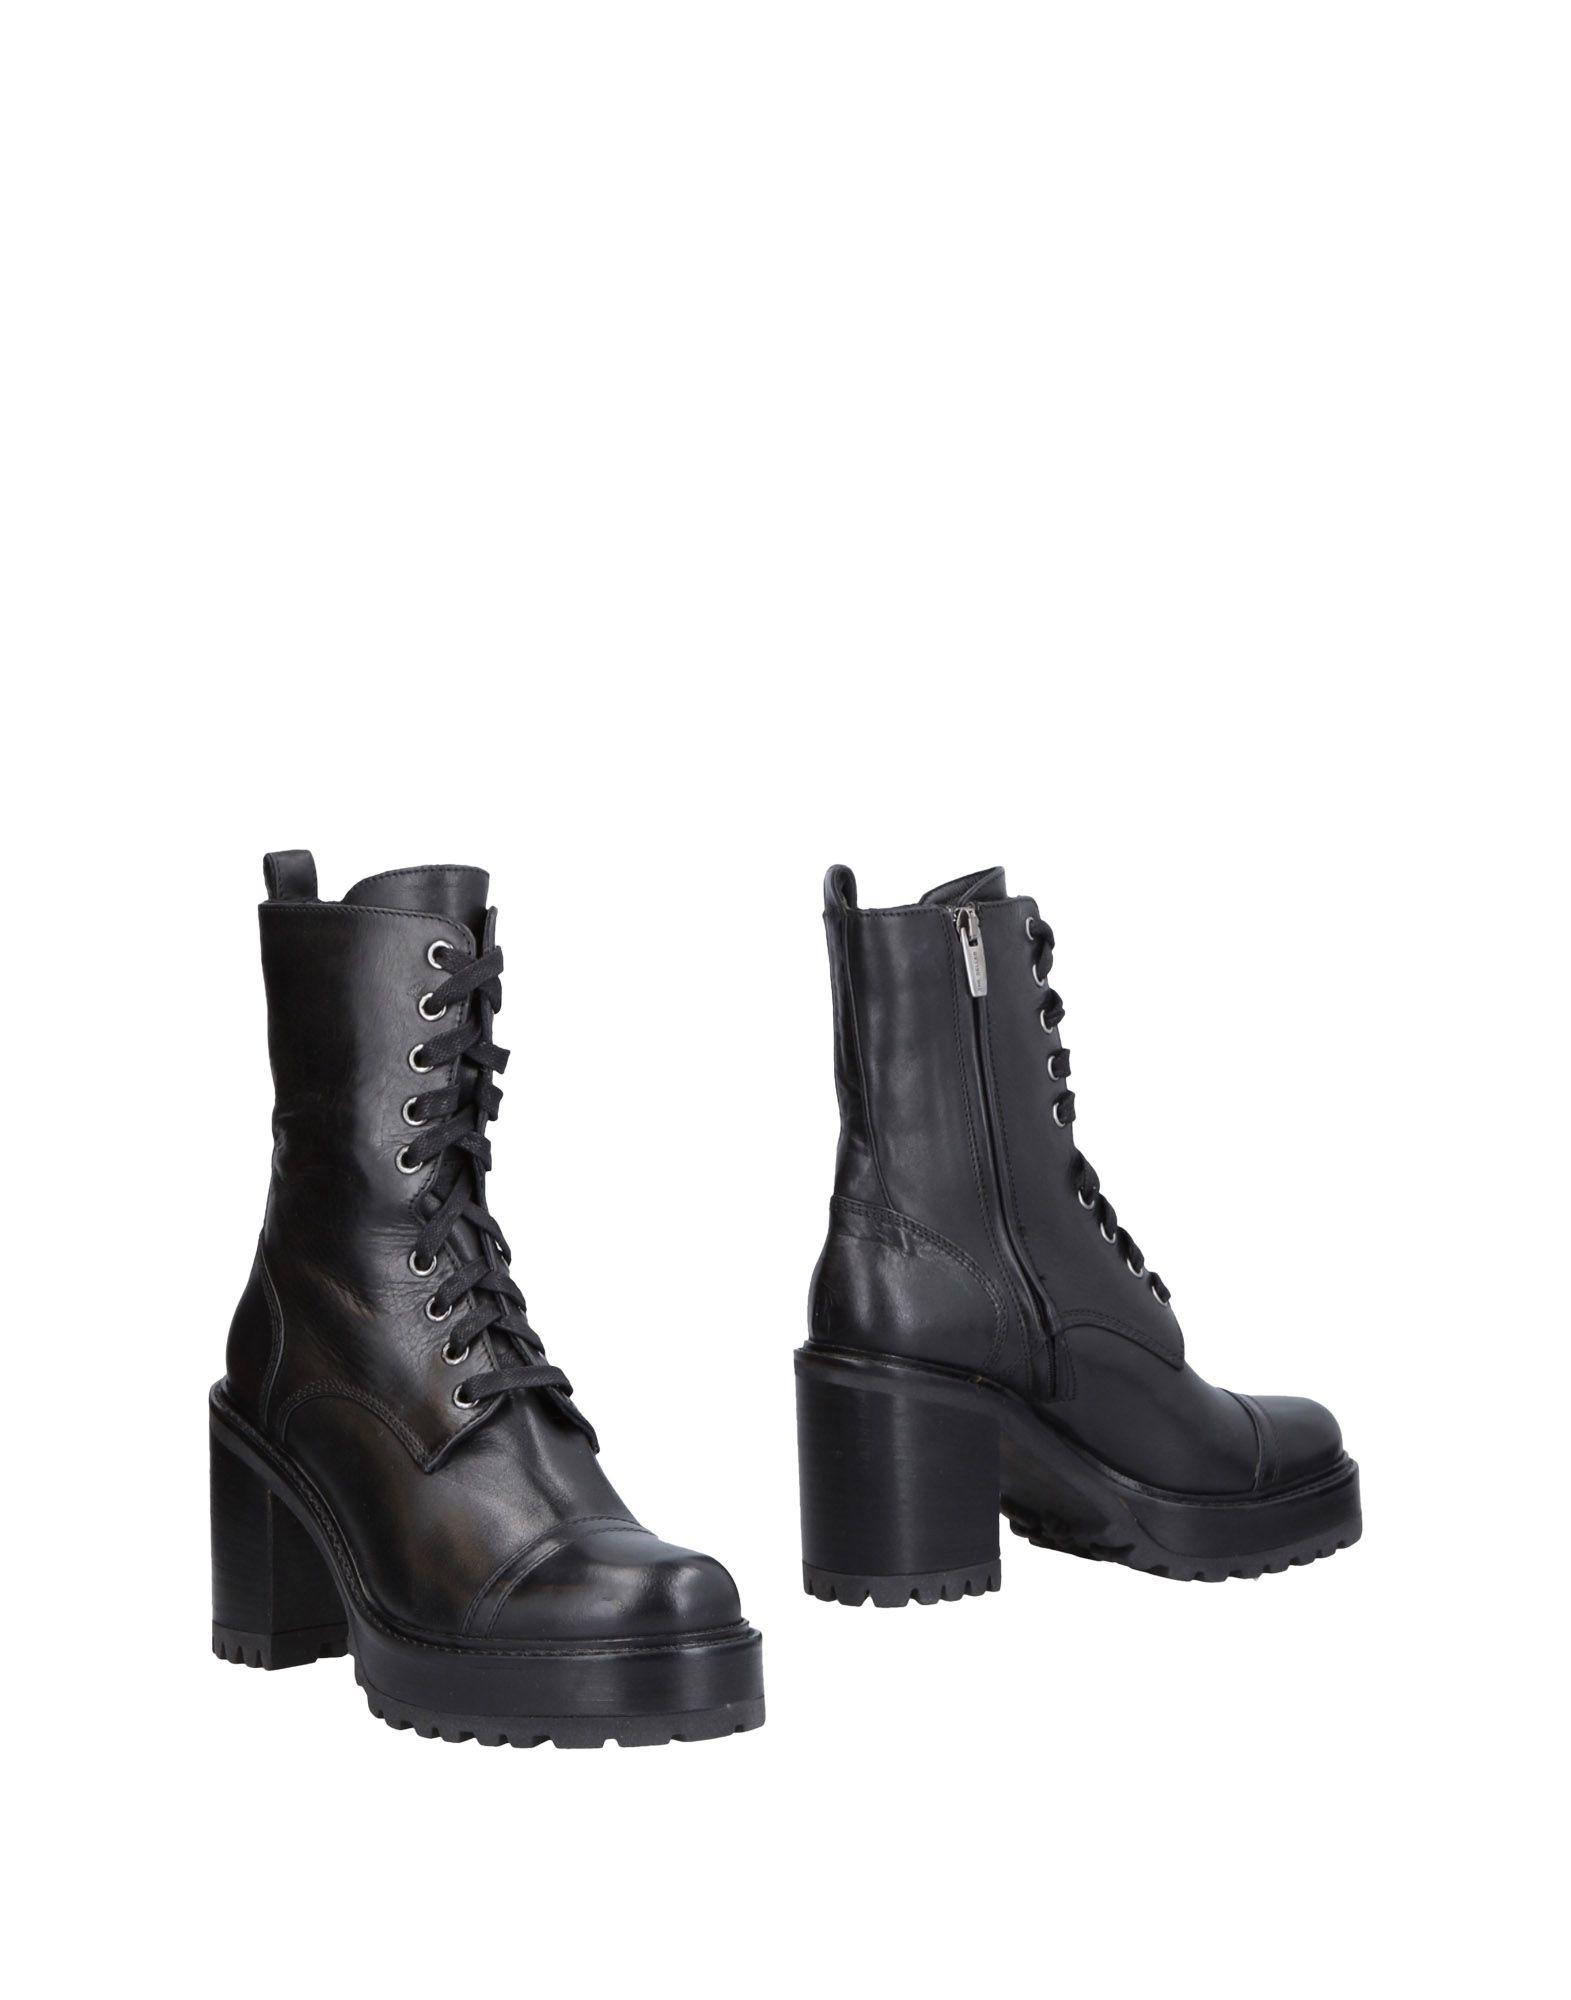 Stilvolle billige Schuhe Damen The Seller Stiefelette Damen Schuhe  11456329CW 12fa6f